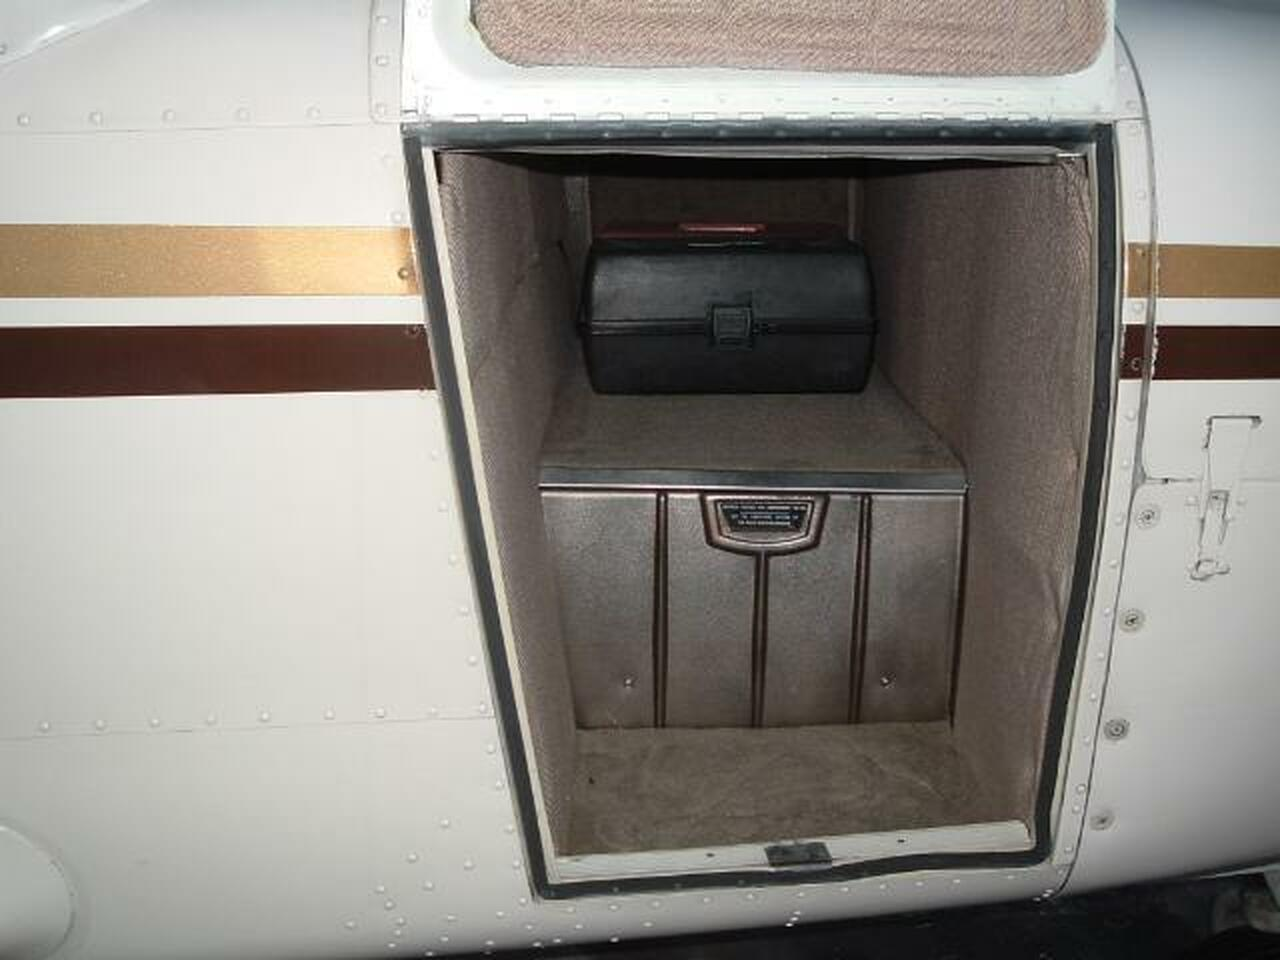 Forward Baggage Door Seal - Fuselage Mount SELF ADHESIVE, Piper PA-32, PA-34, ADS-50005